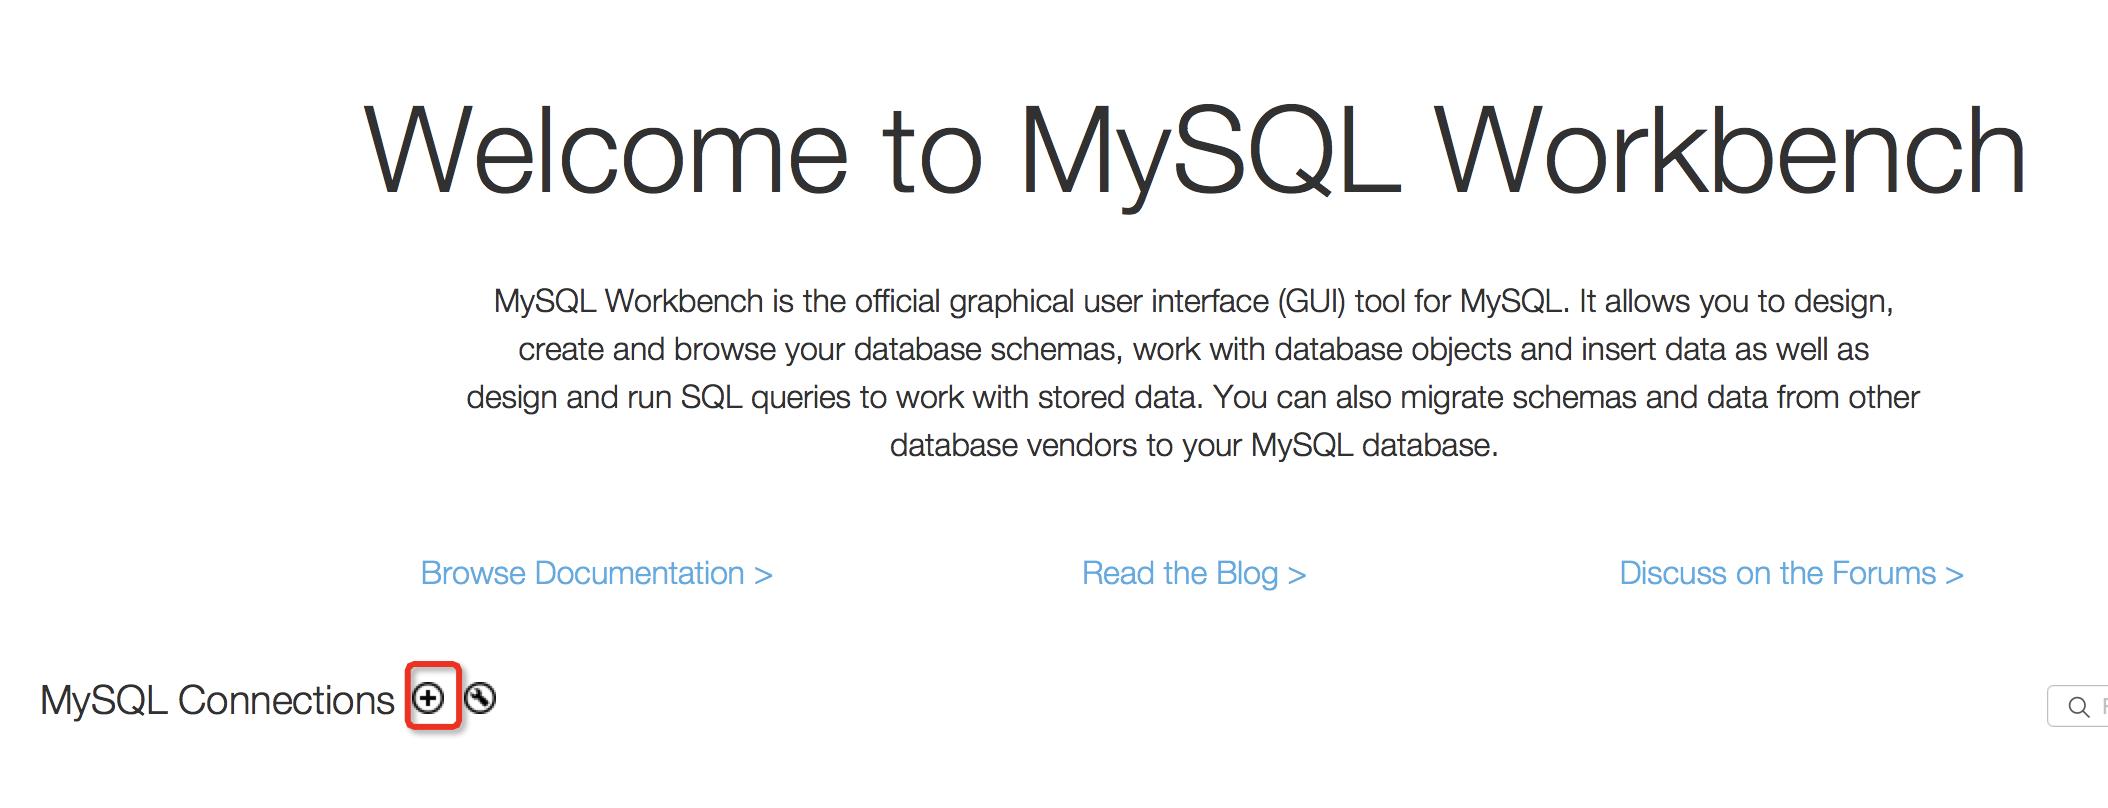 mysql workbench 6.3 create database